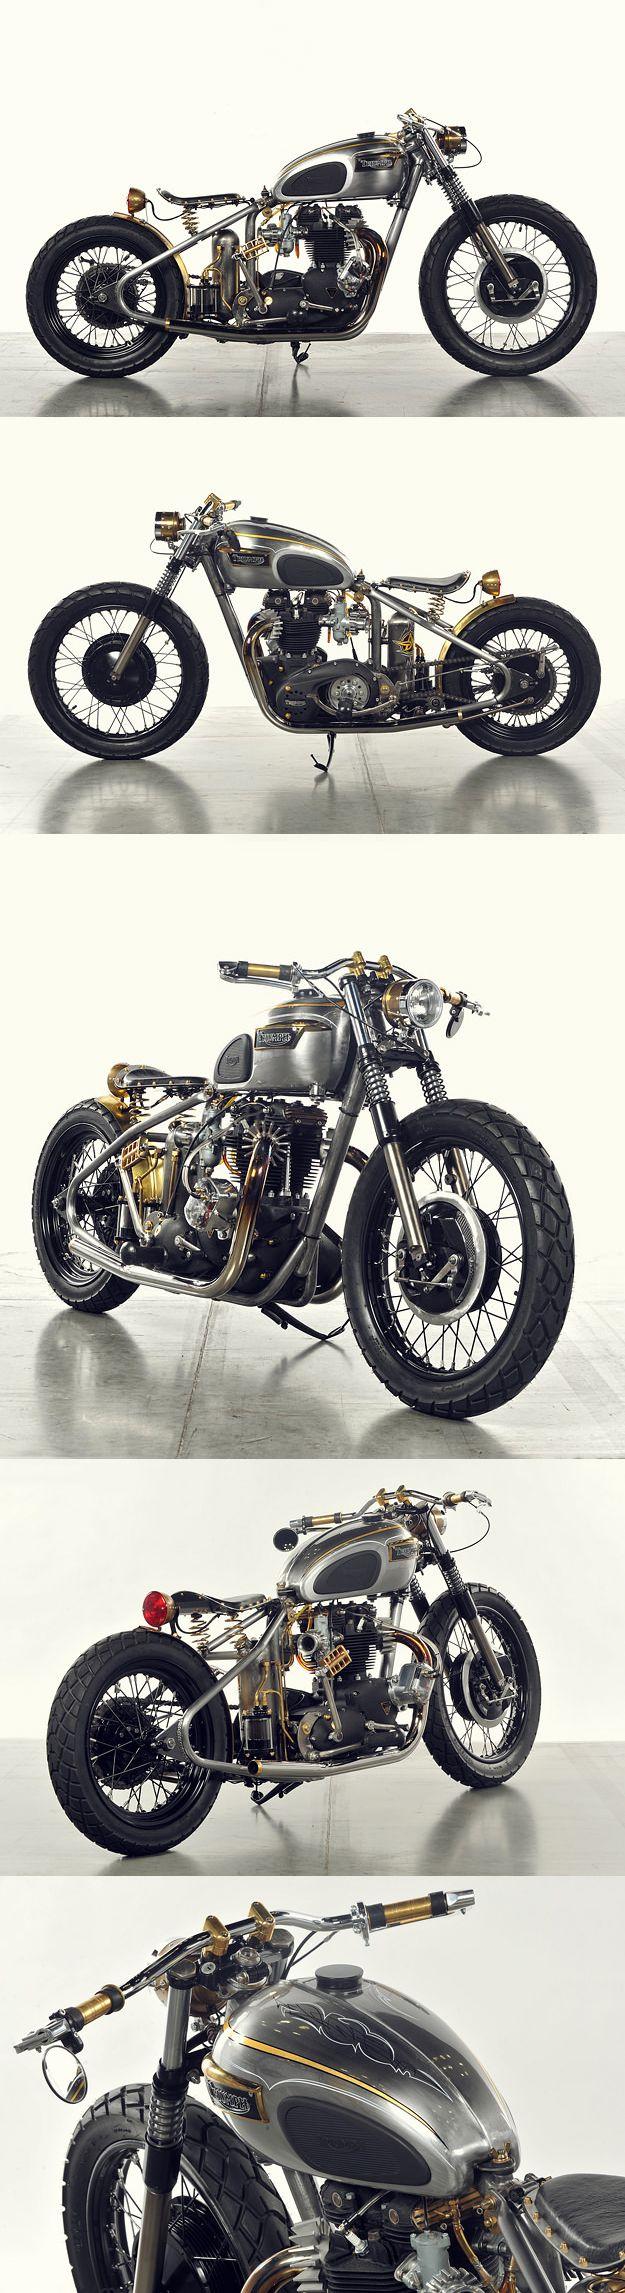 T120-Bonneville- Did I say I love Triumphs !!!